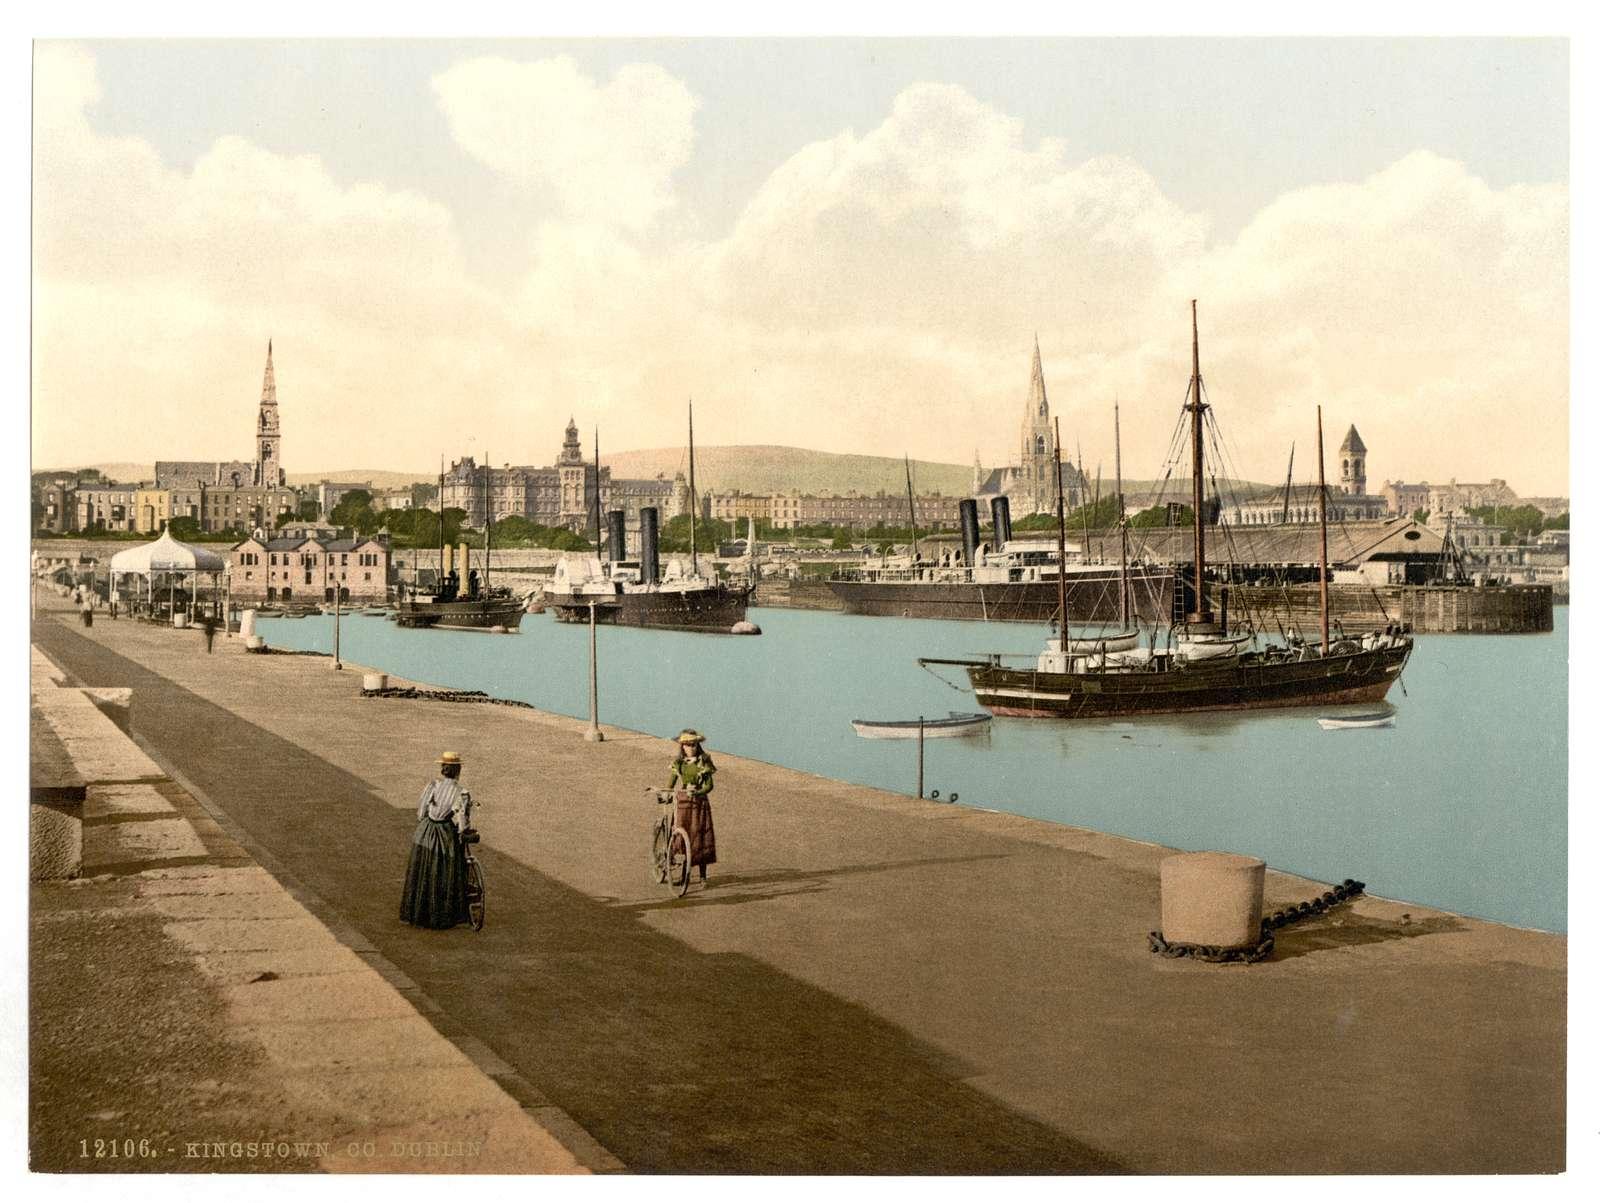 [The Harbor, Kingstown. County Dublin, Ireland]